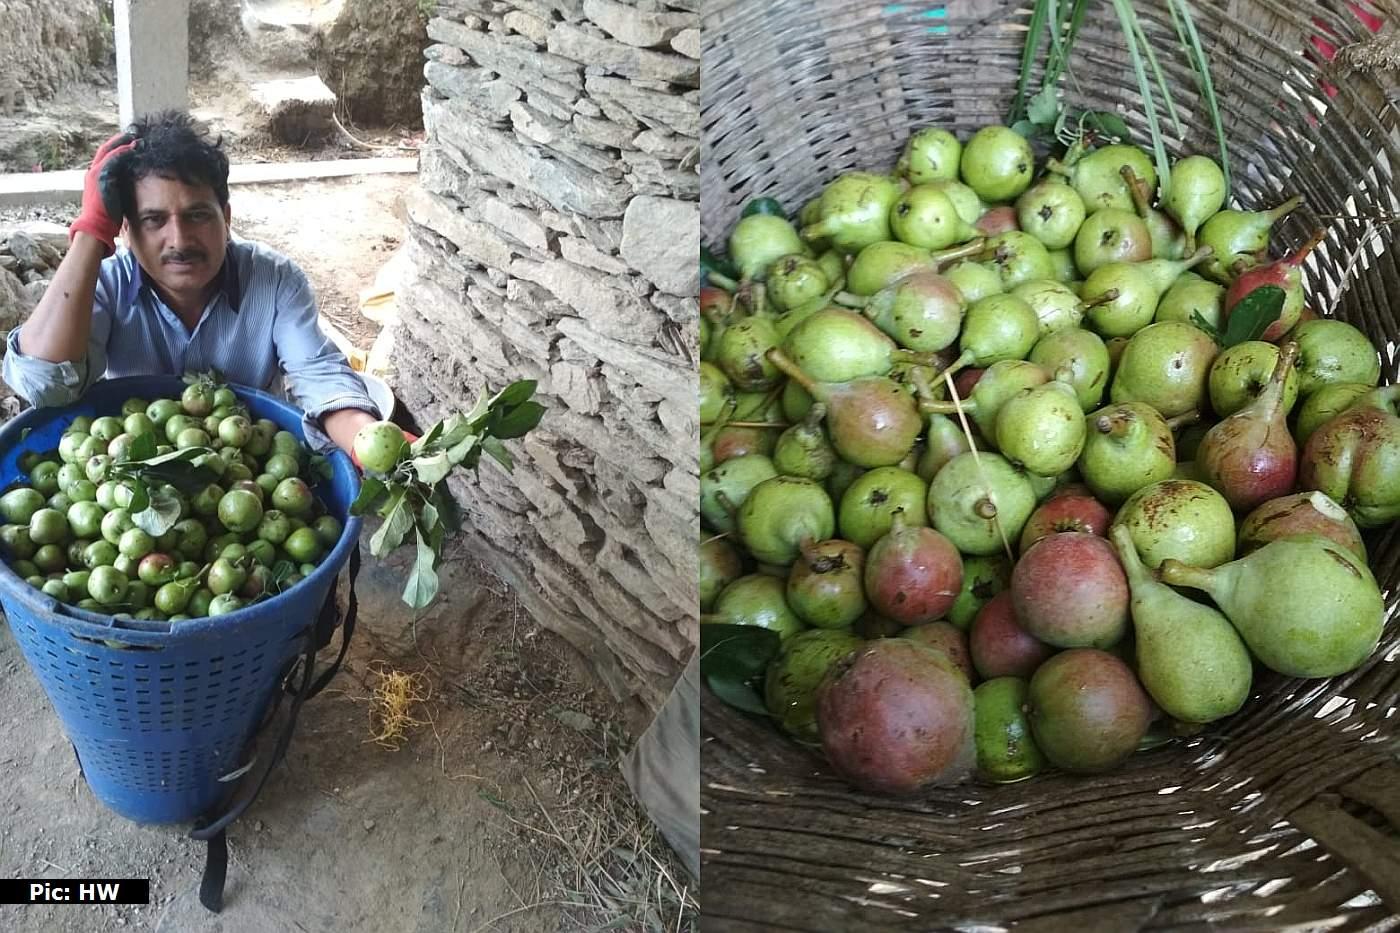 Farmers in Himachal Pradesh Demand Compensation